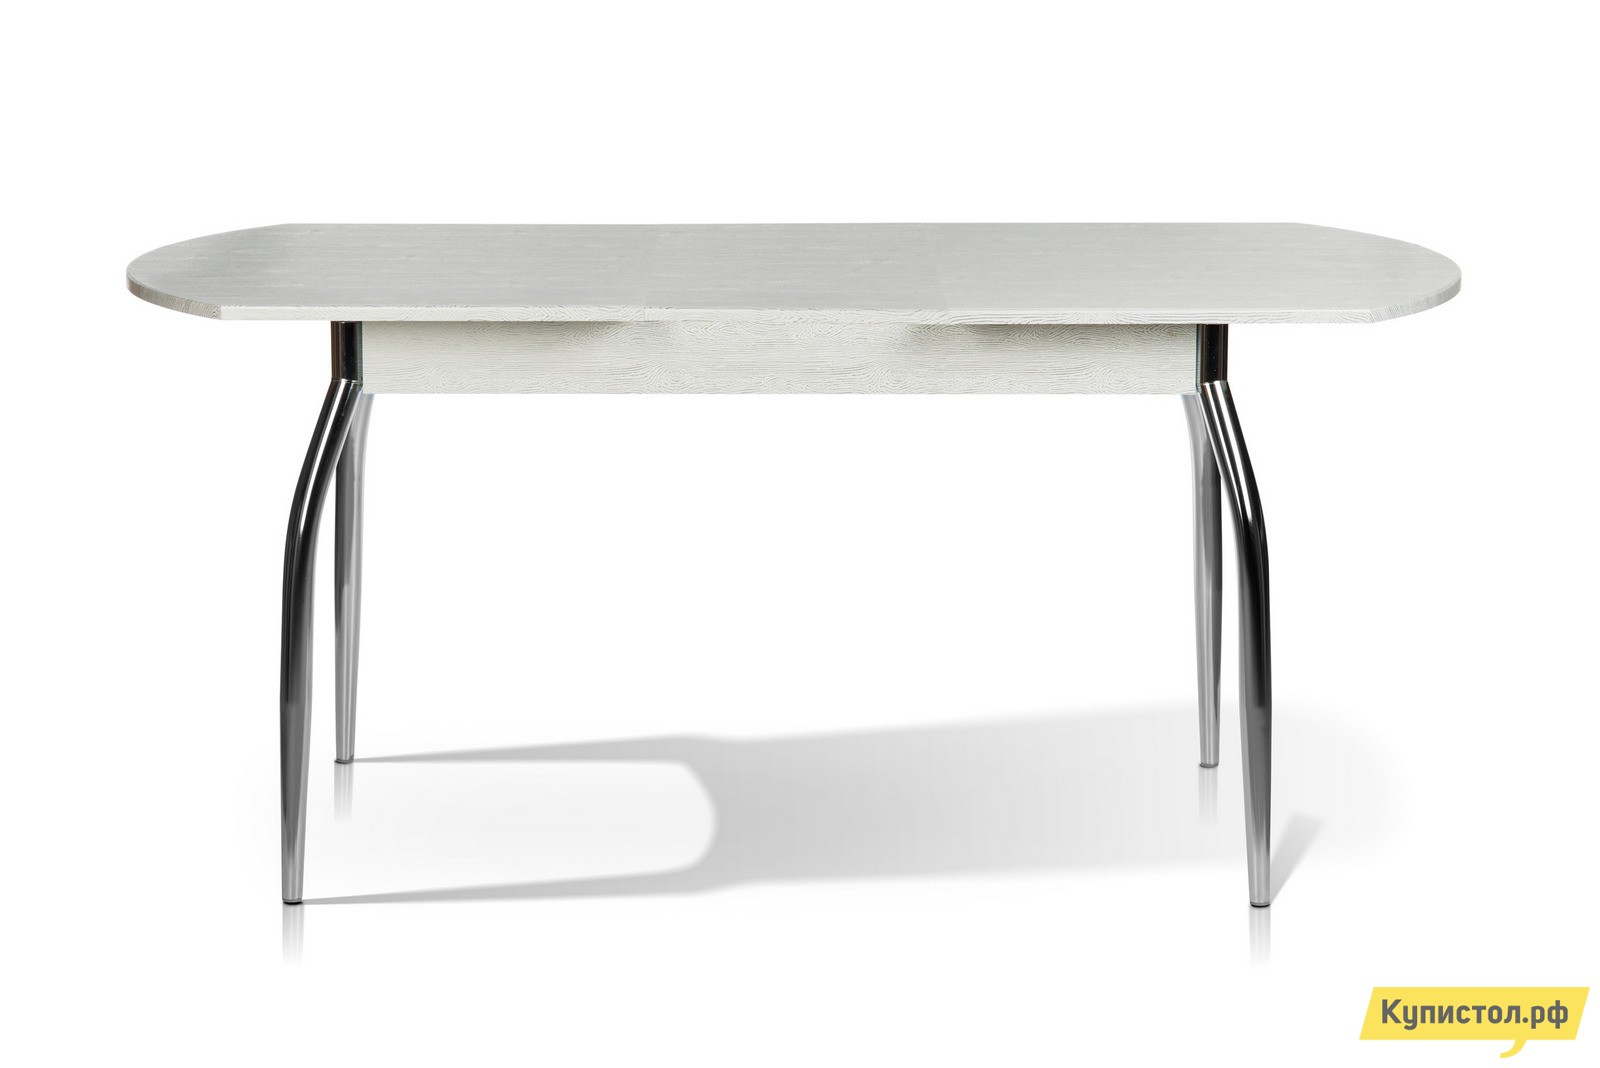 Кухонный стол МегаЭлатон Сиена Мини Дуб белый патина